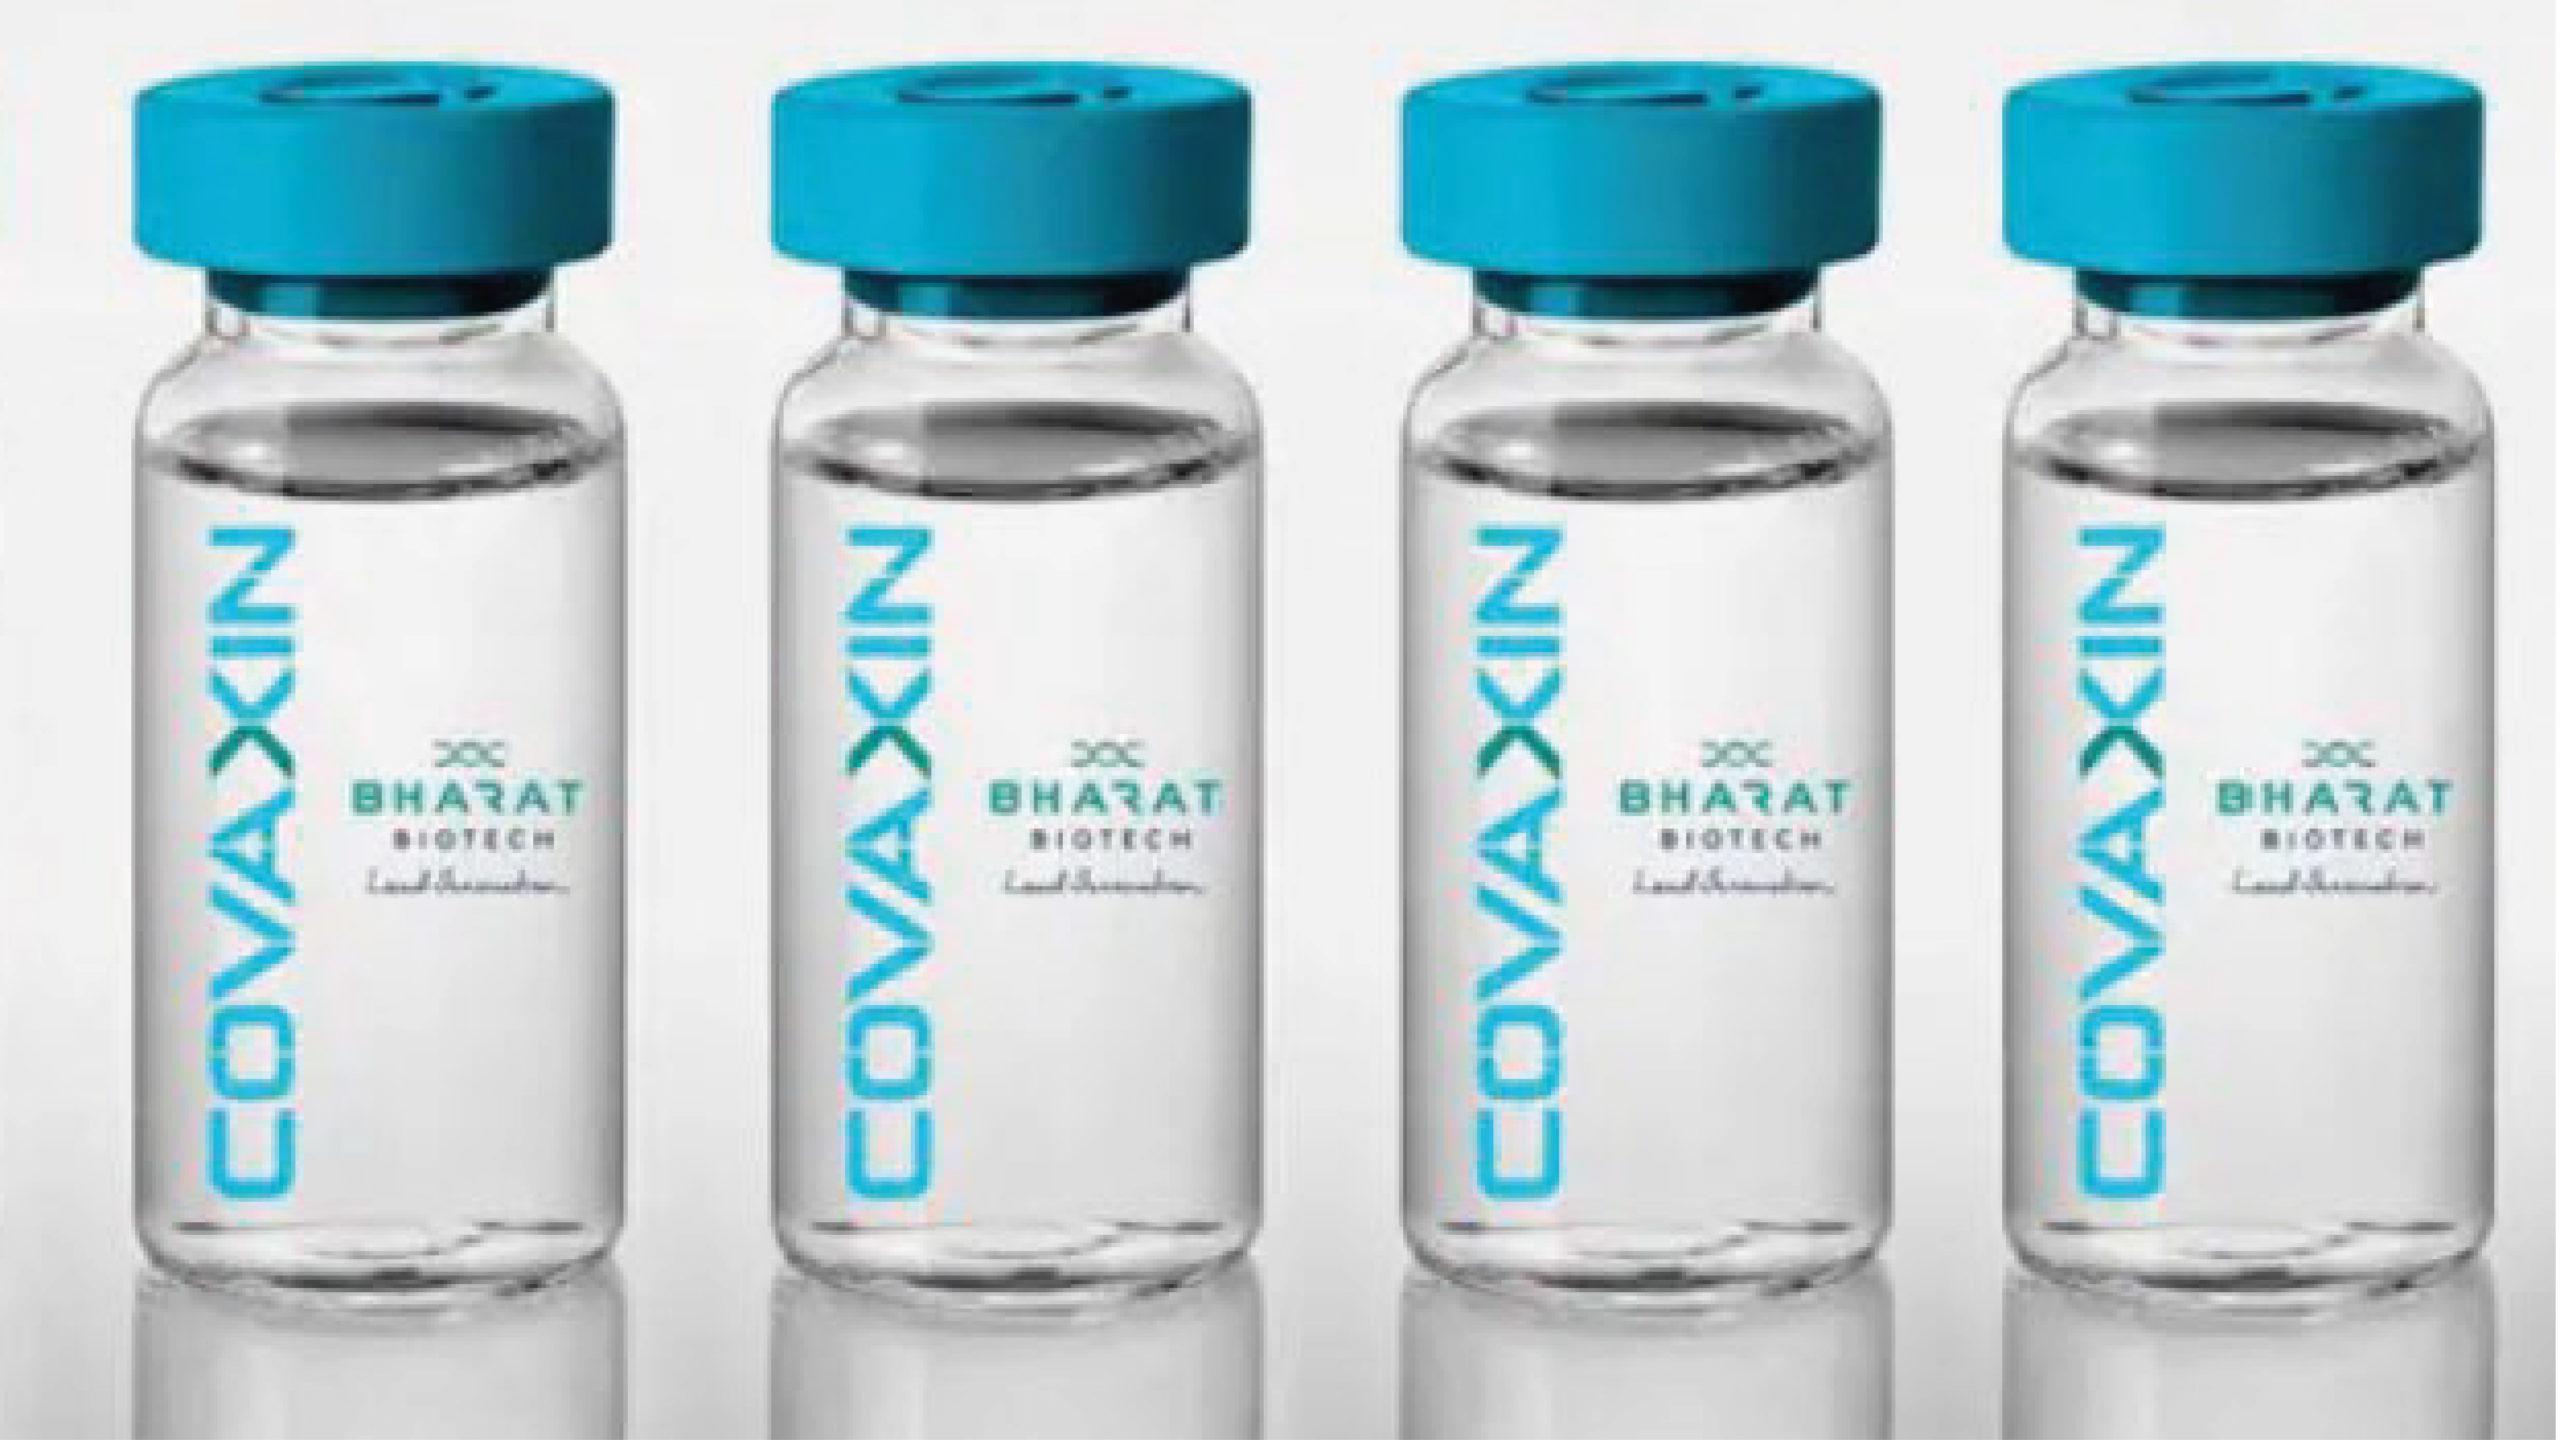 Vacuna india Covaxin, avalada por México, tiene 78% de eficacia